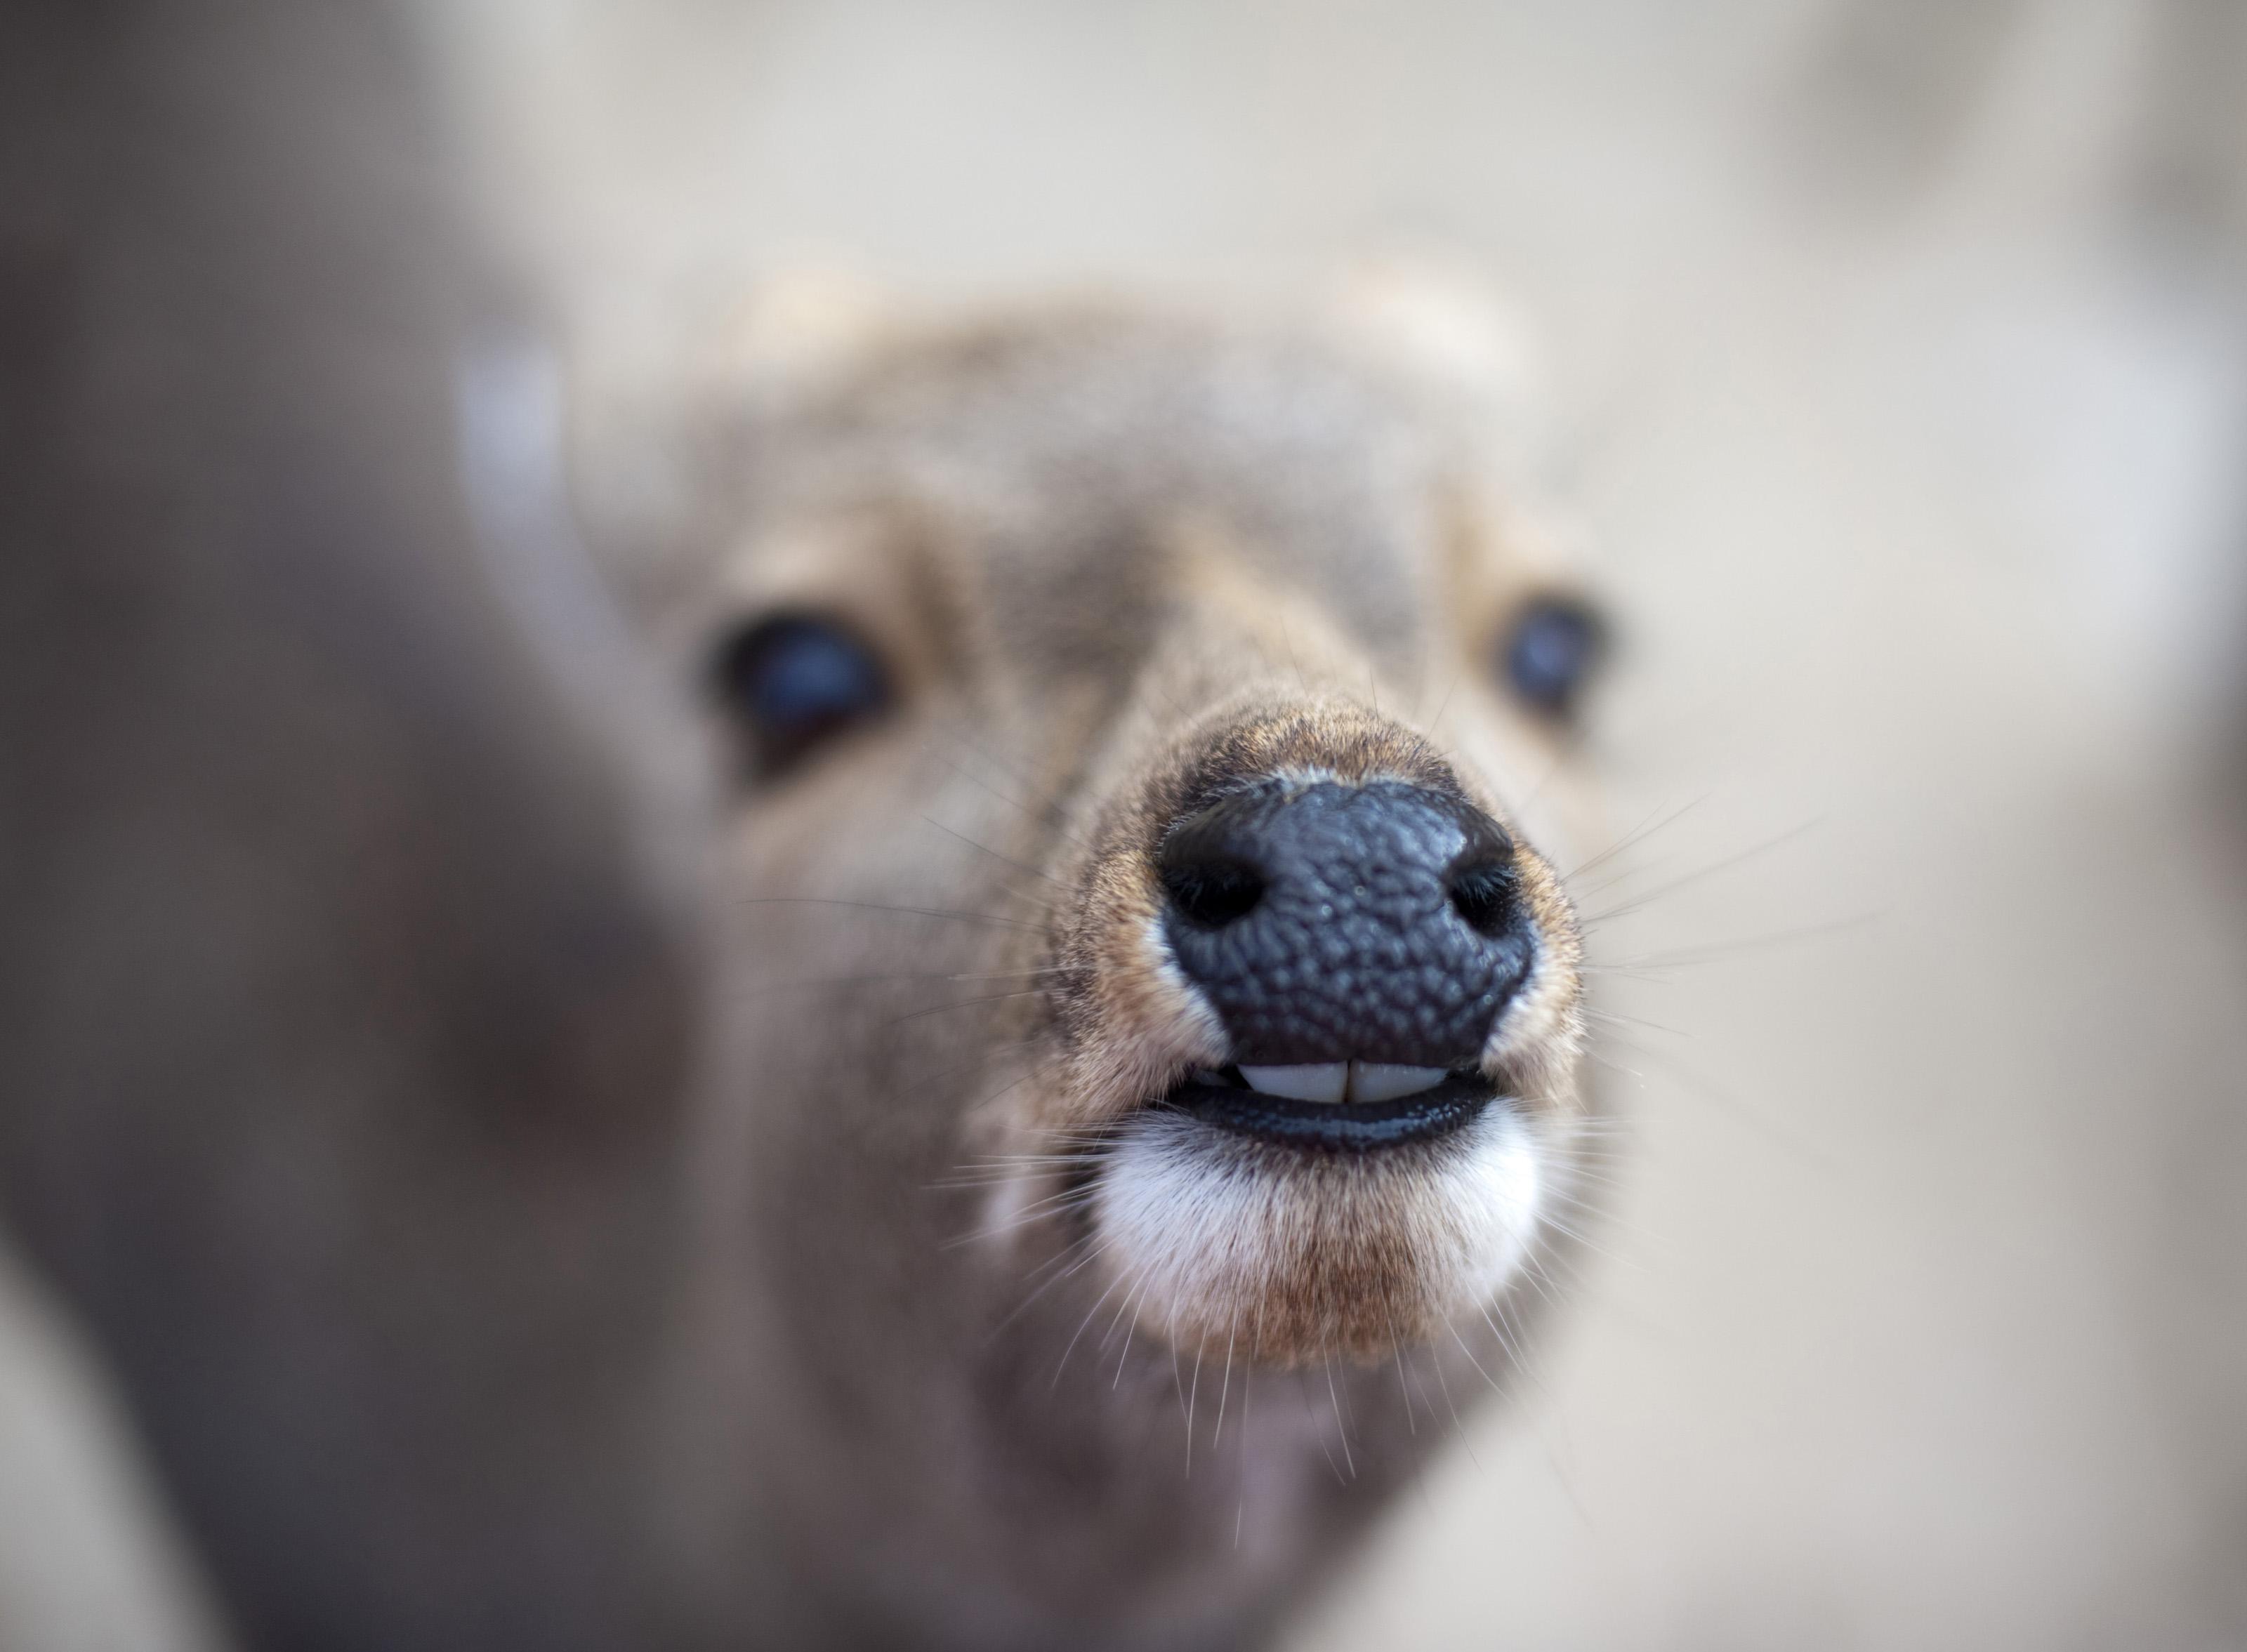 Deer teeth-5592 | Stockarch Free Stock Photos